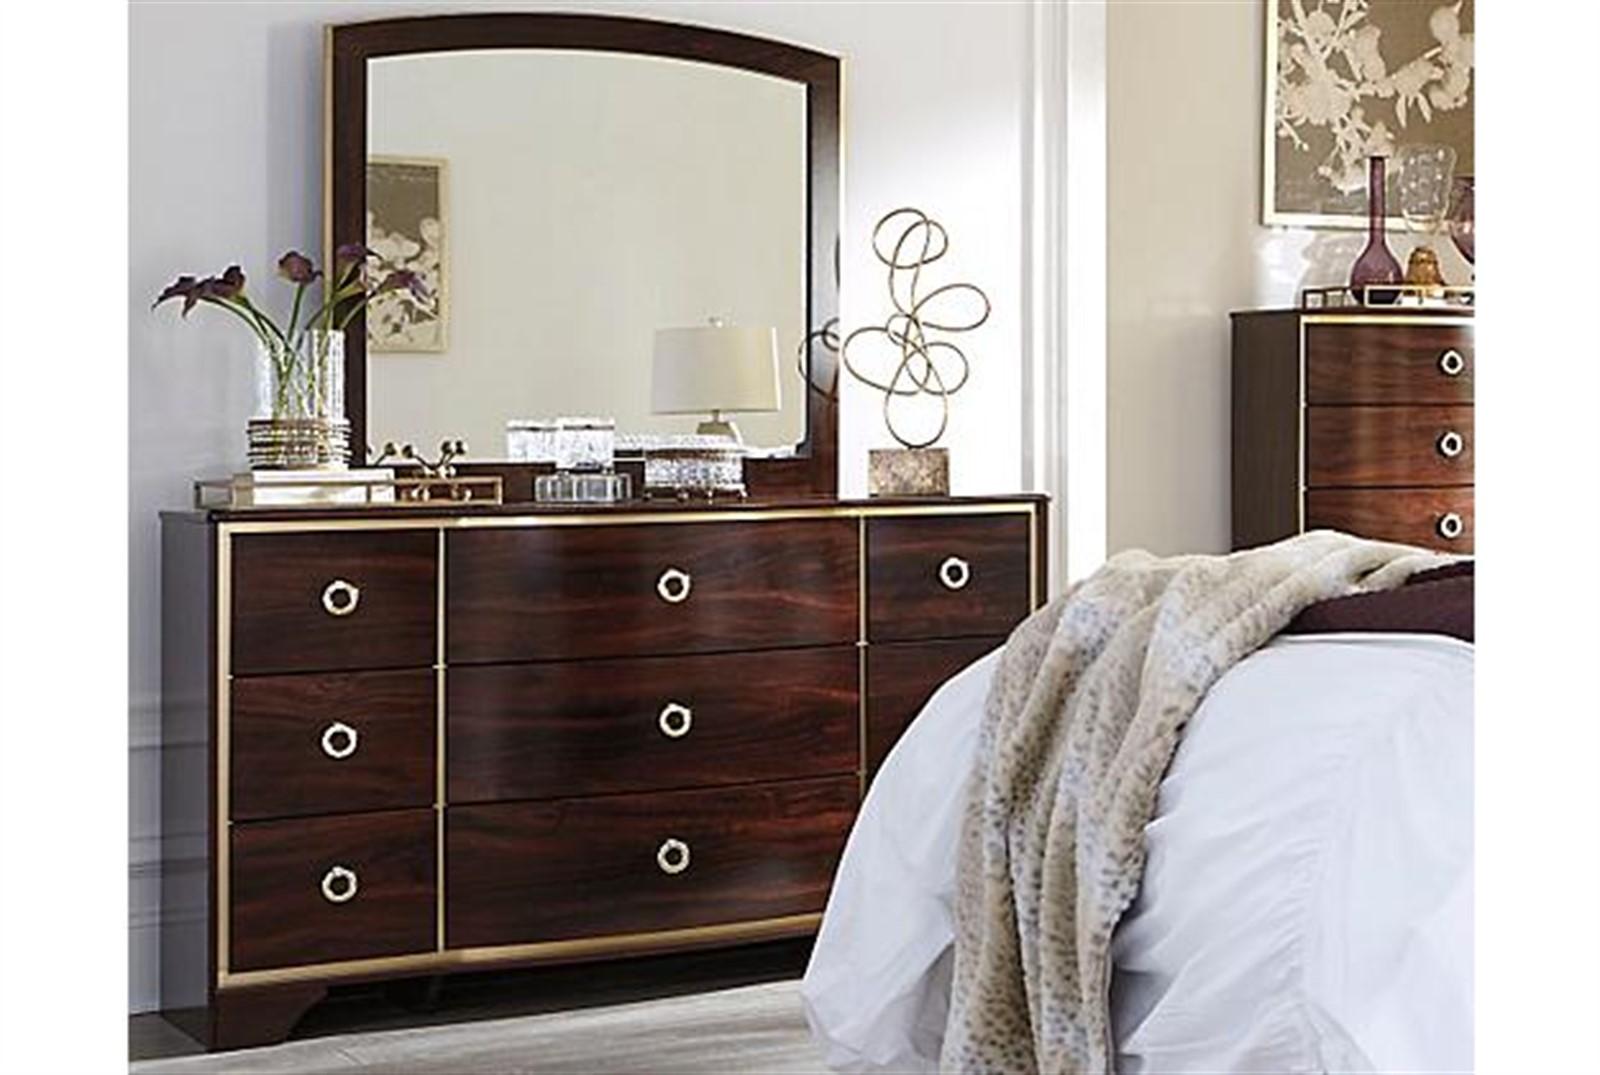 Lenmara Dresser and Mirror Set - Reddish Brown